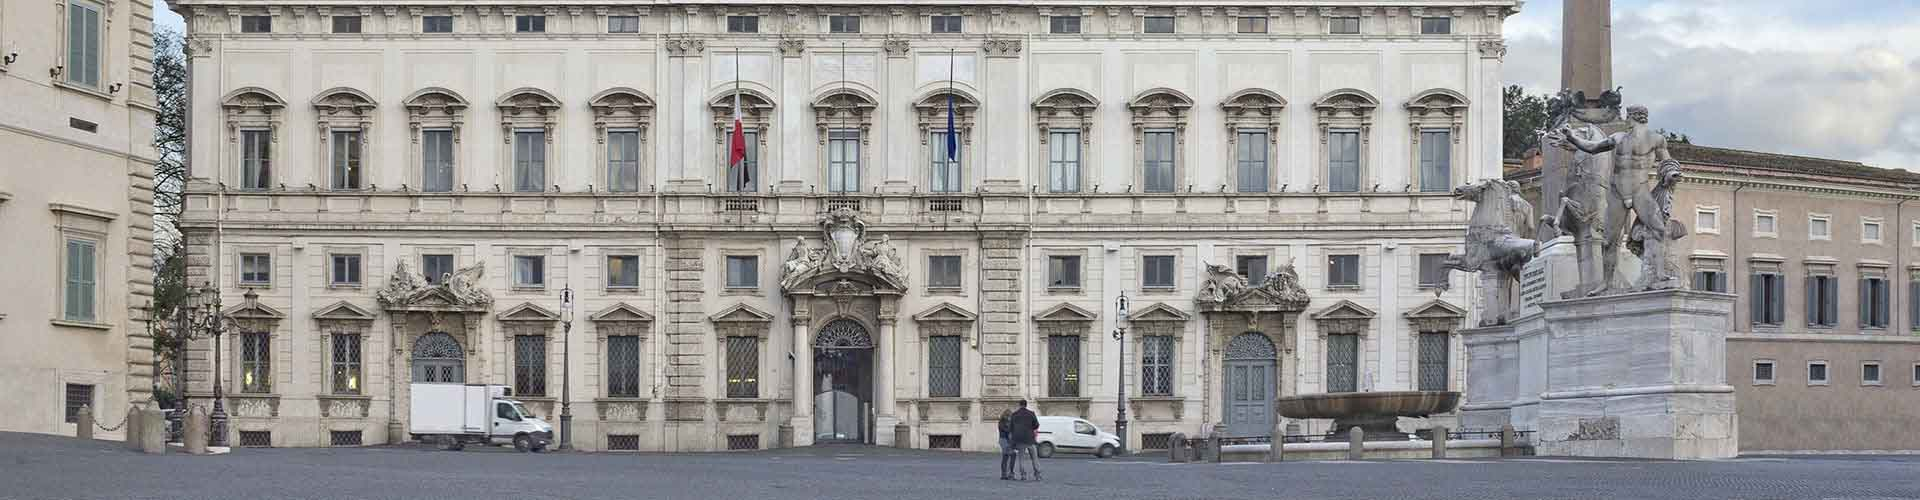 Roma - Albergues Juveniles cerca a Palacio del Quirinal. Mapas de Roma, Fotos y Comentarios para cada Albergue Juvenil en Roma.